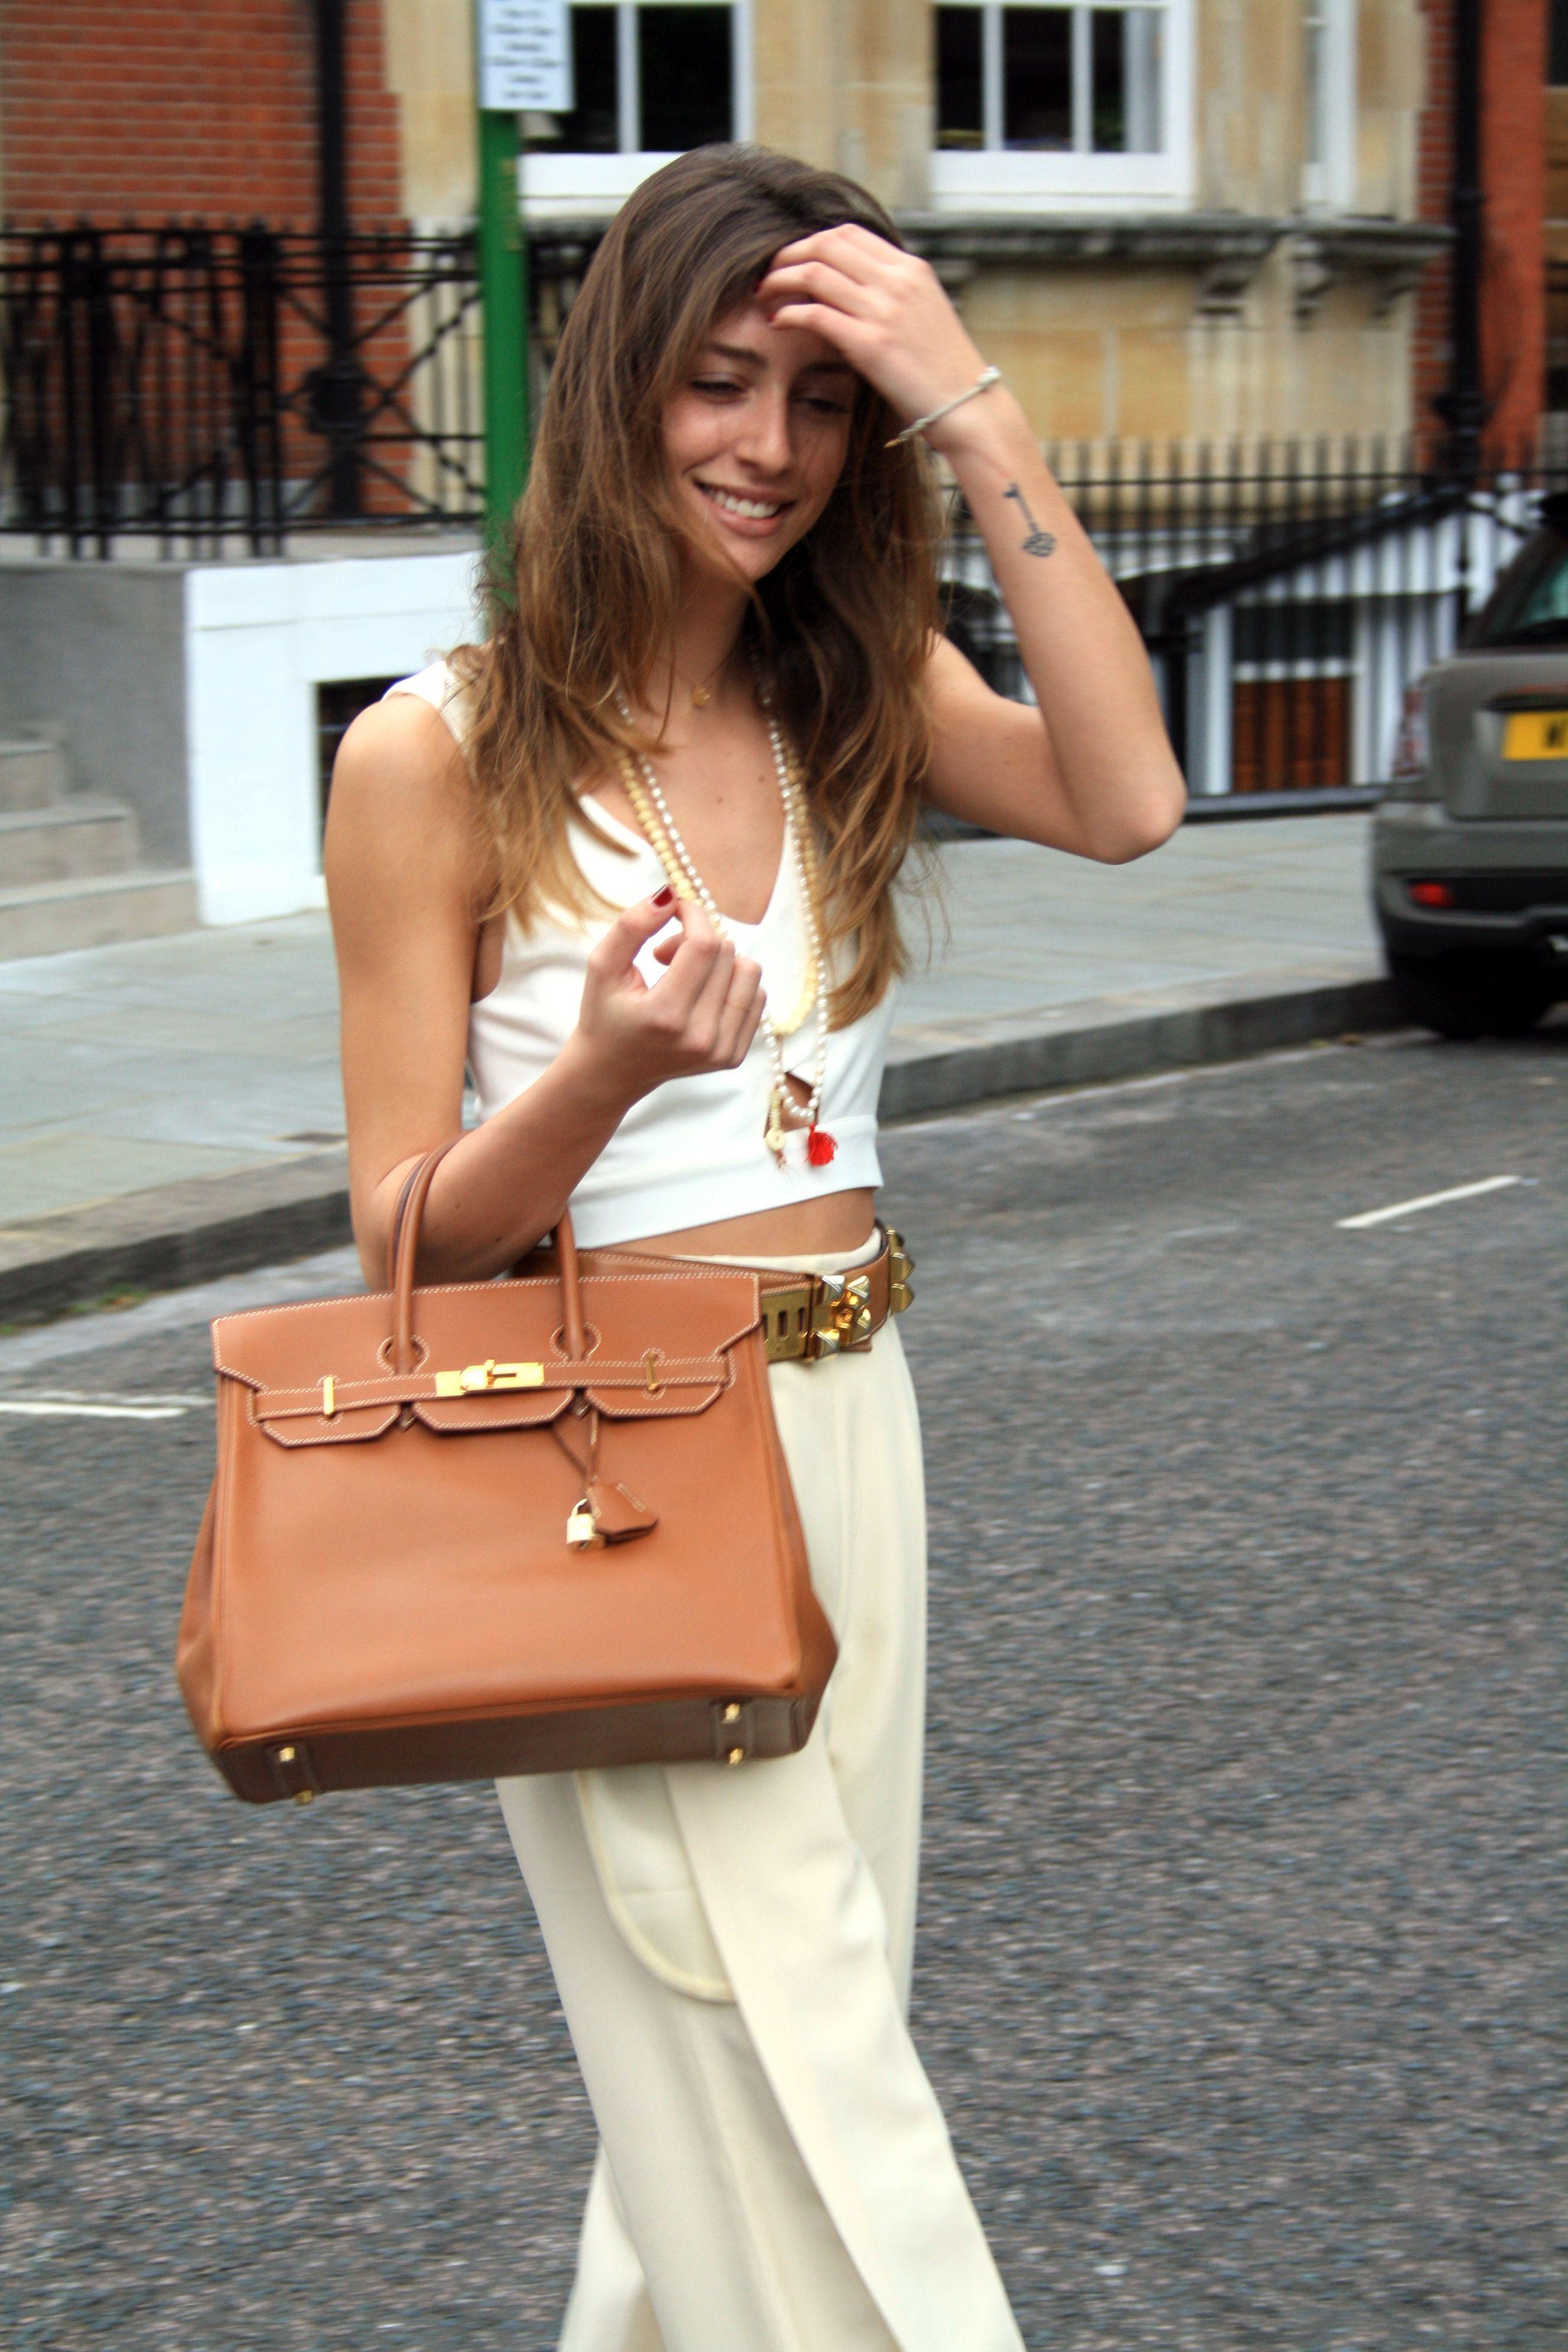 #streetstyle #fashion #hermes #birkin #masionmargiela #outfit #inmylittlemind  inmylittlemind.com